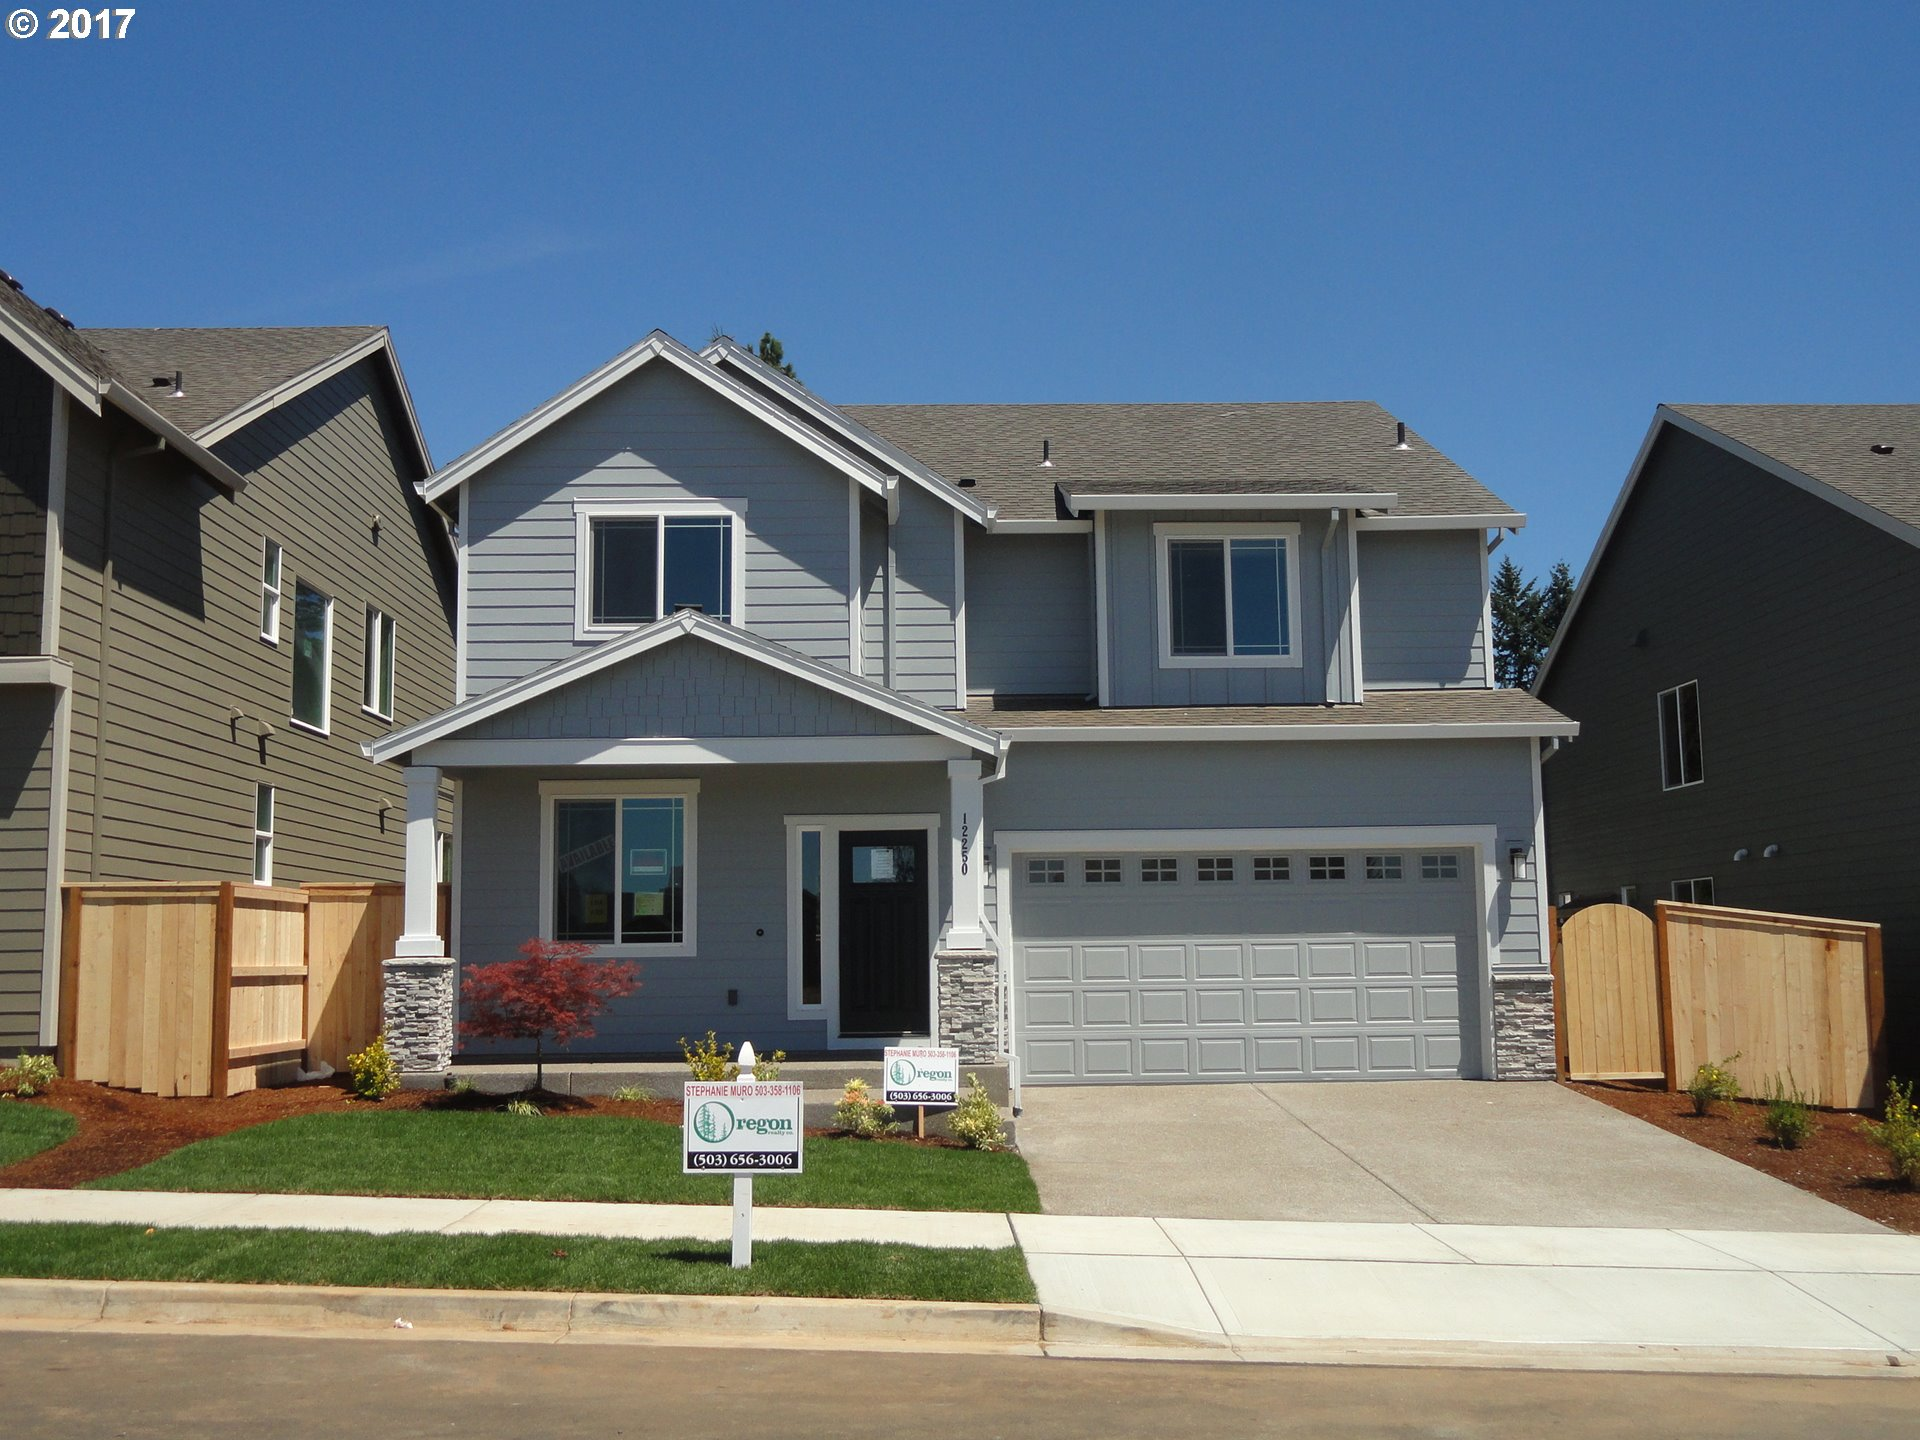 12250 Mimosa WAY, Oregon City OR 97045